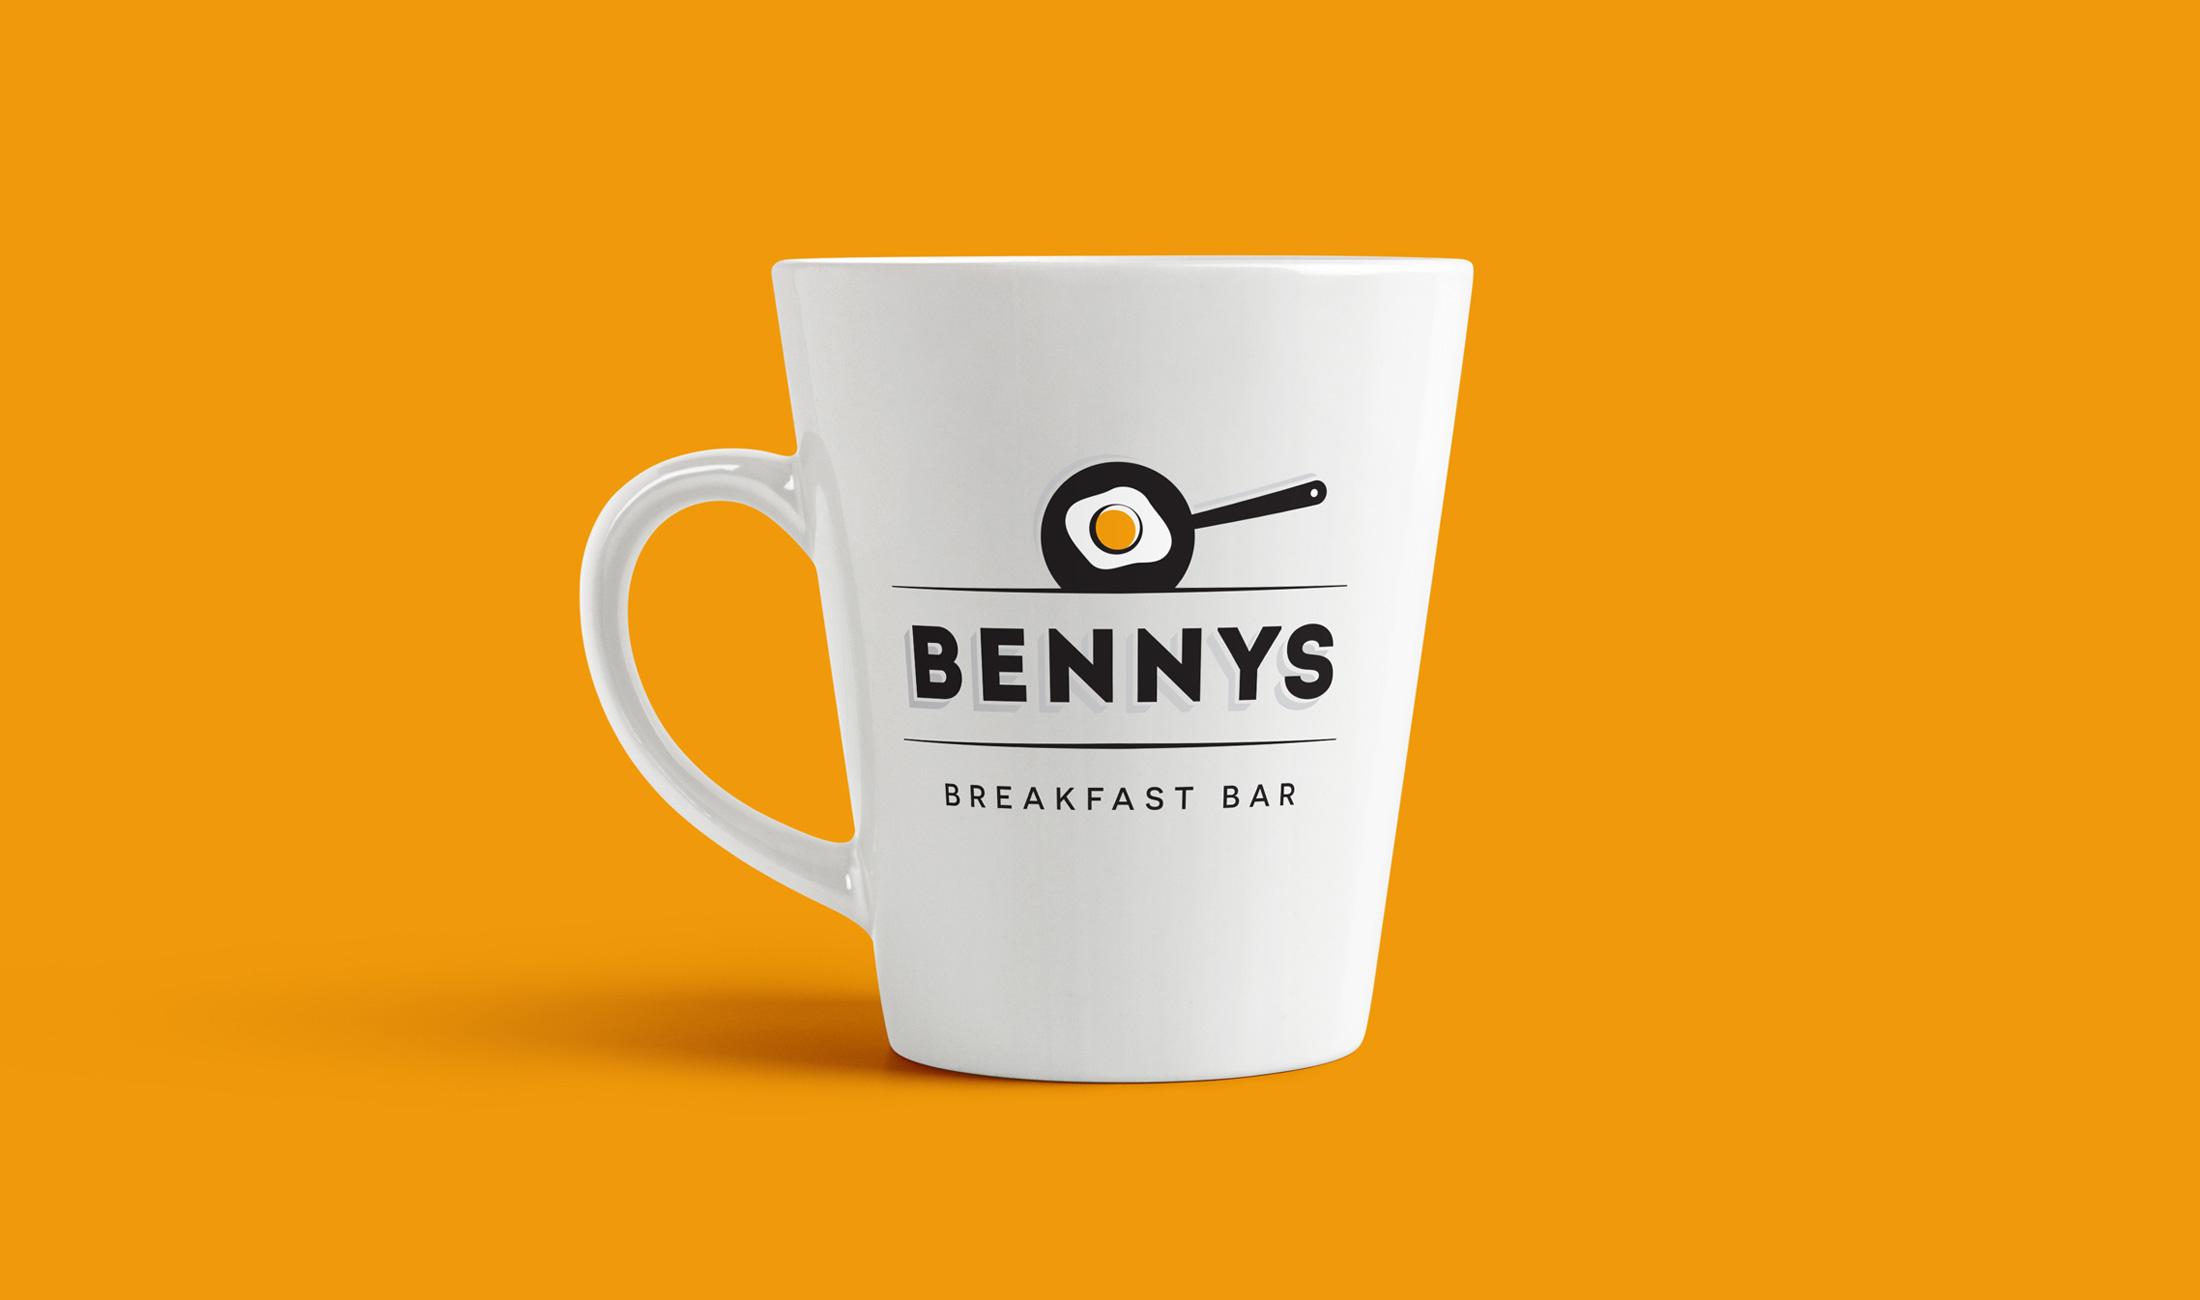 Bennys logo on a coffee mug